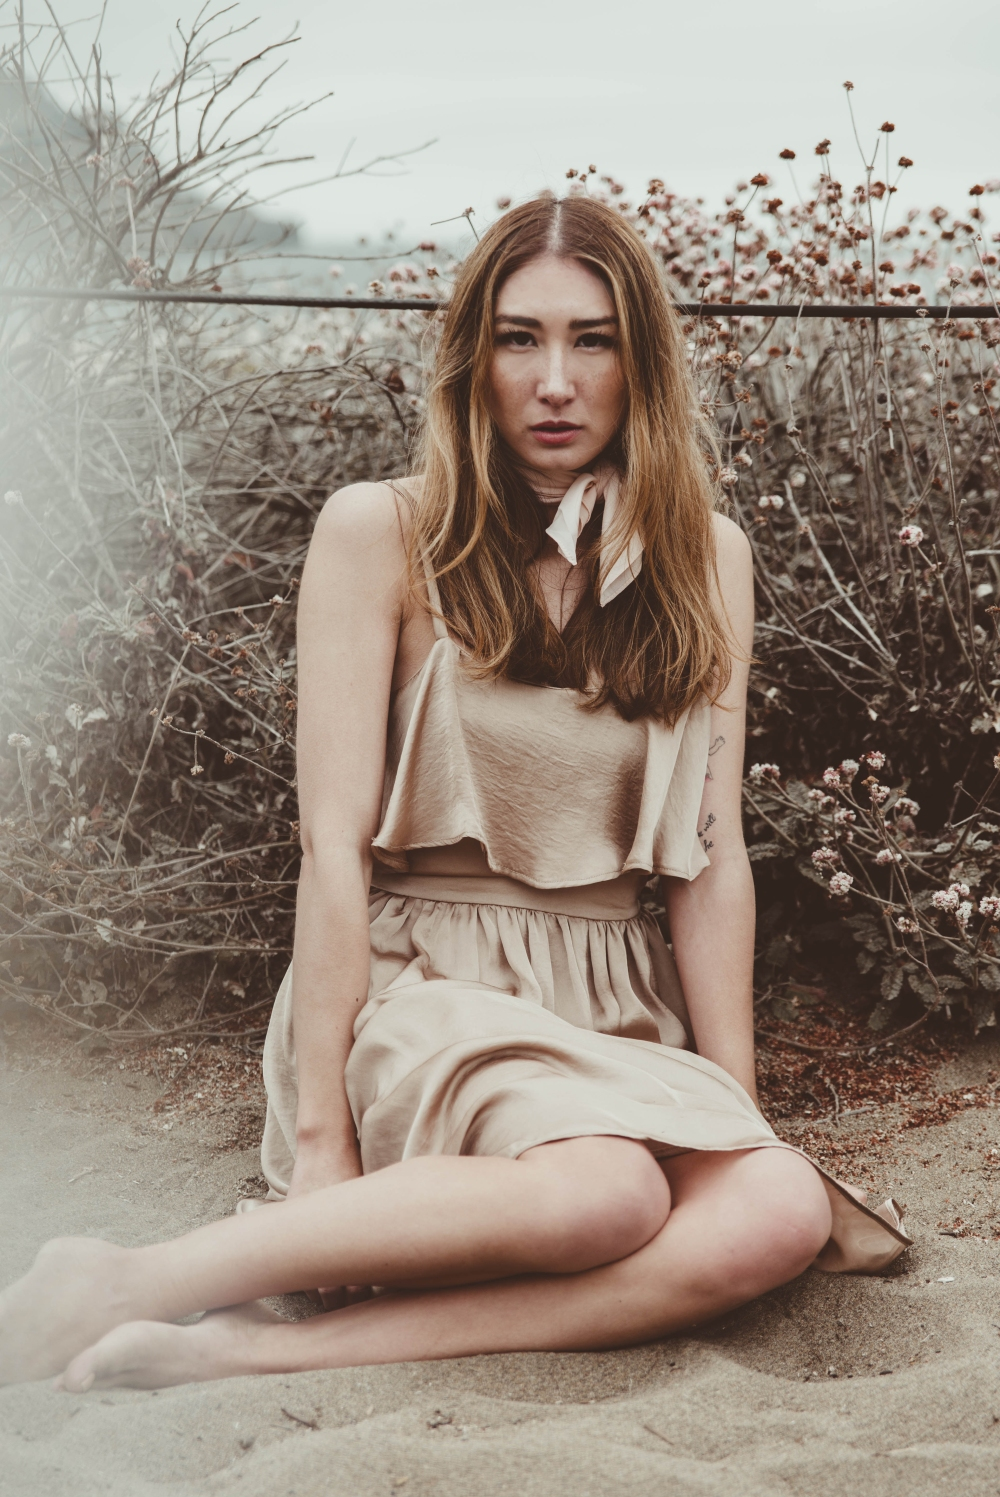 coastal-drifter-alyssa-nicole-emma-dress-bronze-2